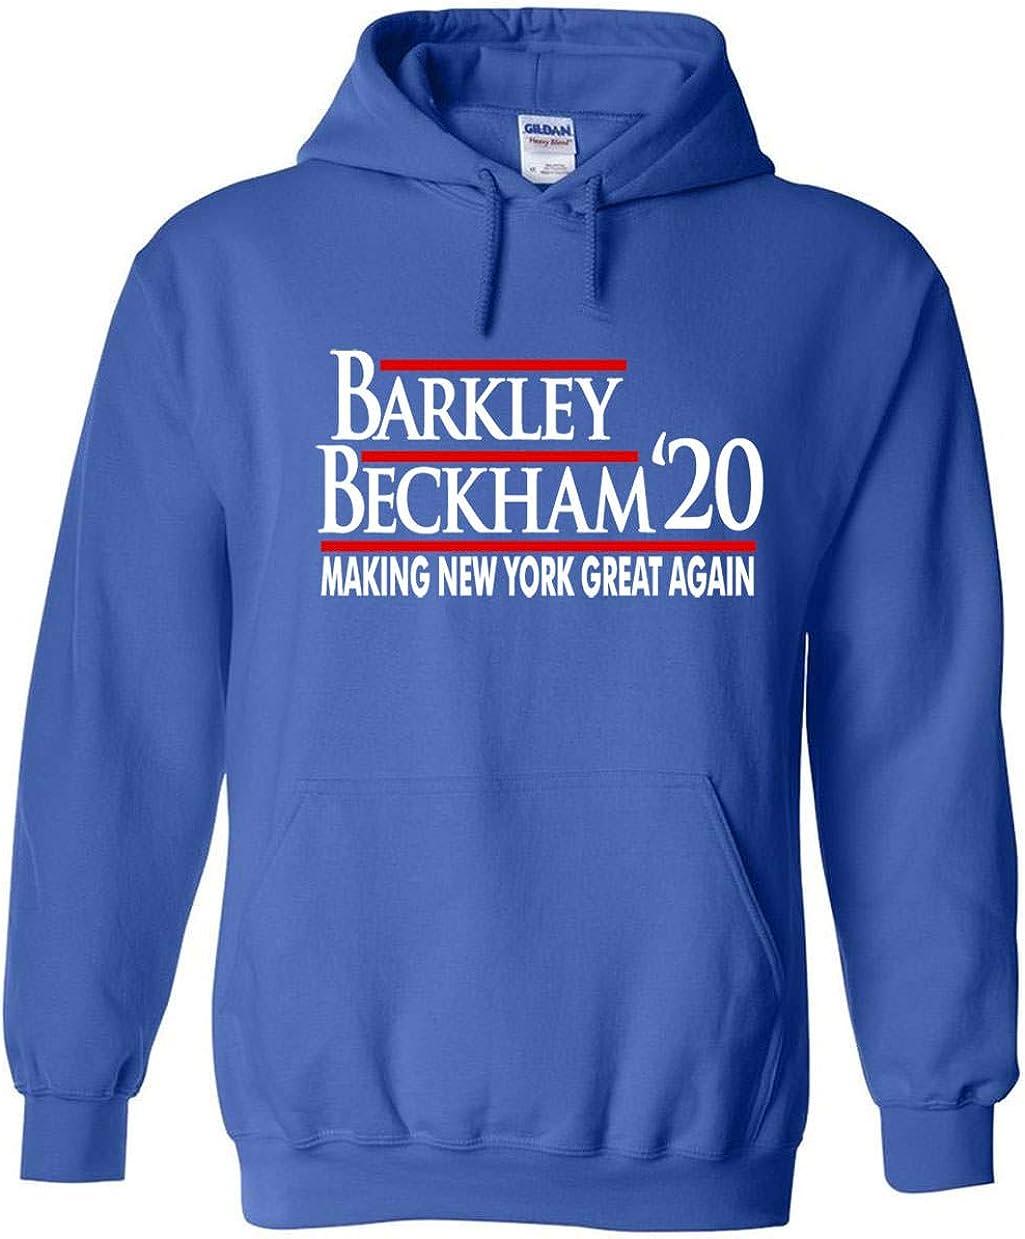 PROSPECT SHIRTS Blue York Barkley 2020 Hooded Sweatshirt